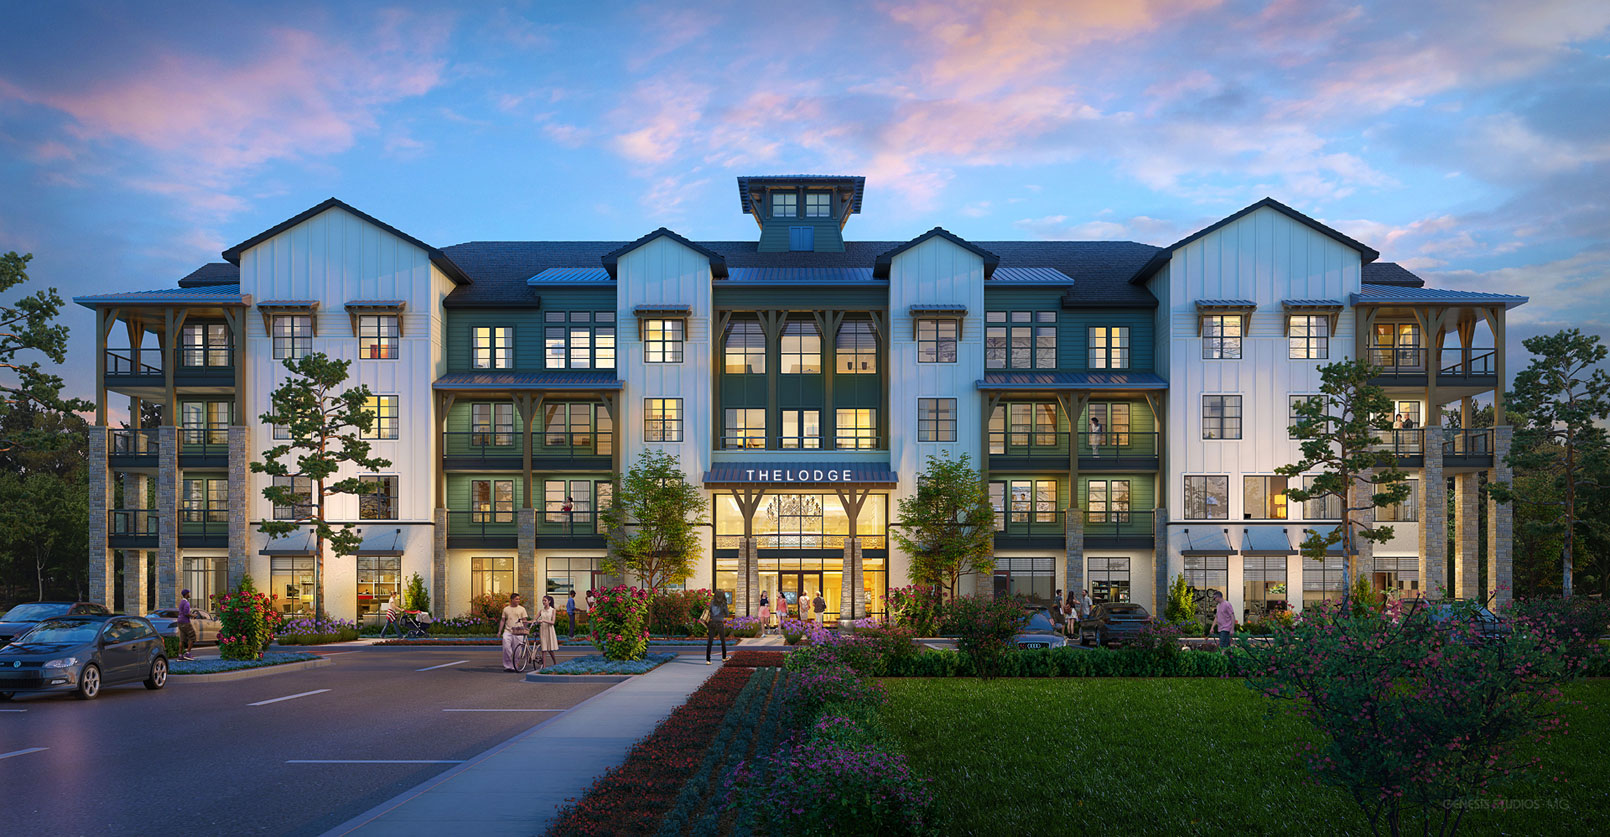 818082 Digital Photorealistic Architectural Renderings of The Lodge at Hamlin Leasing Building for Charlan Brock Associates